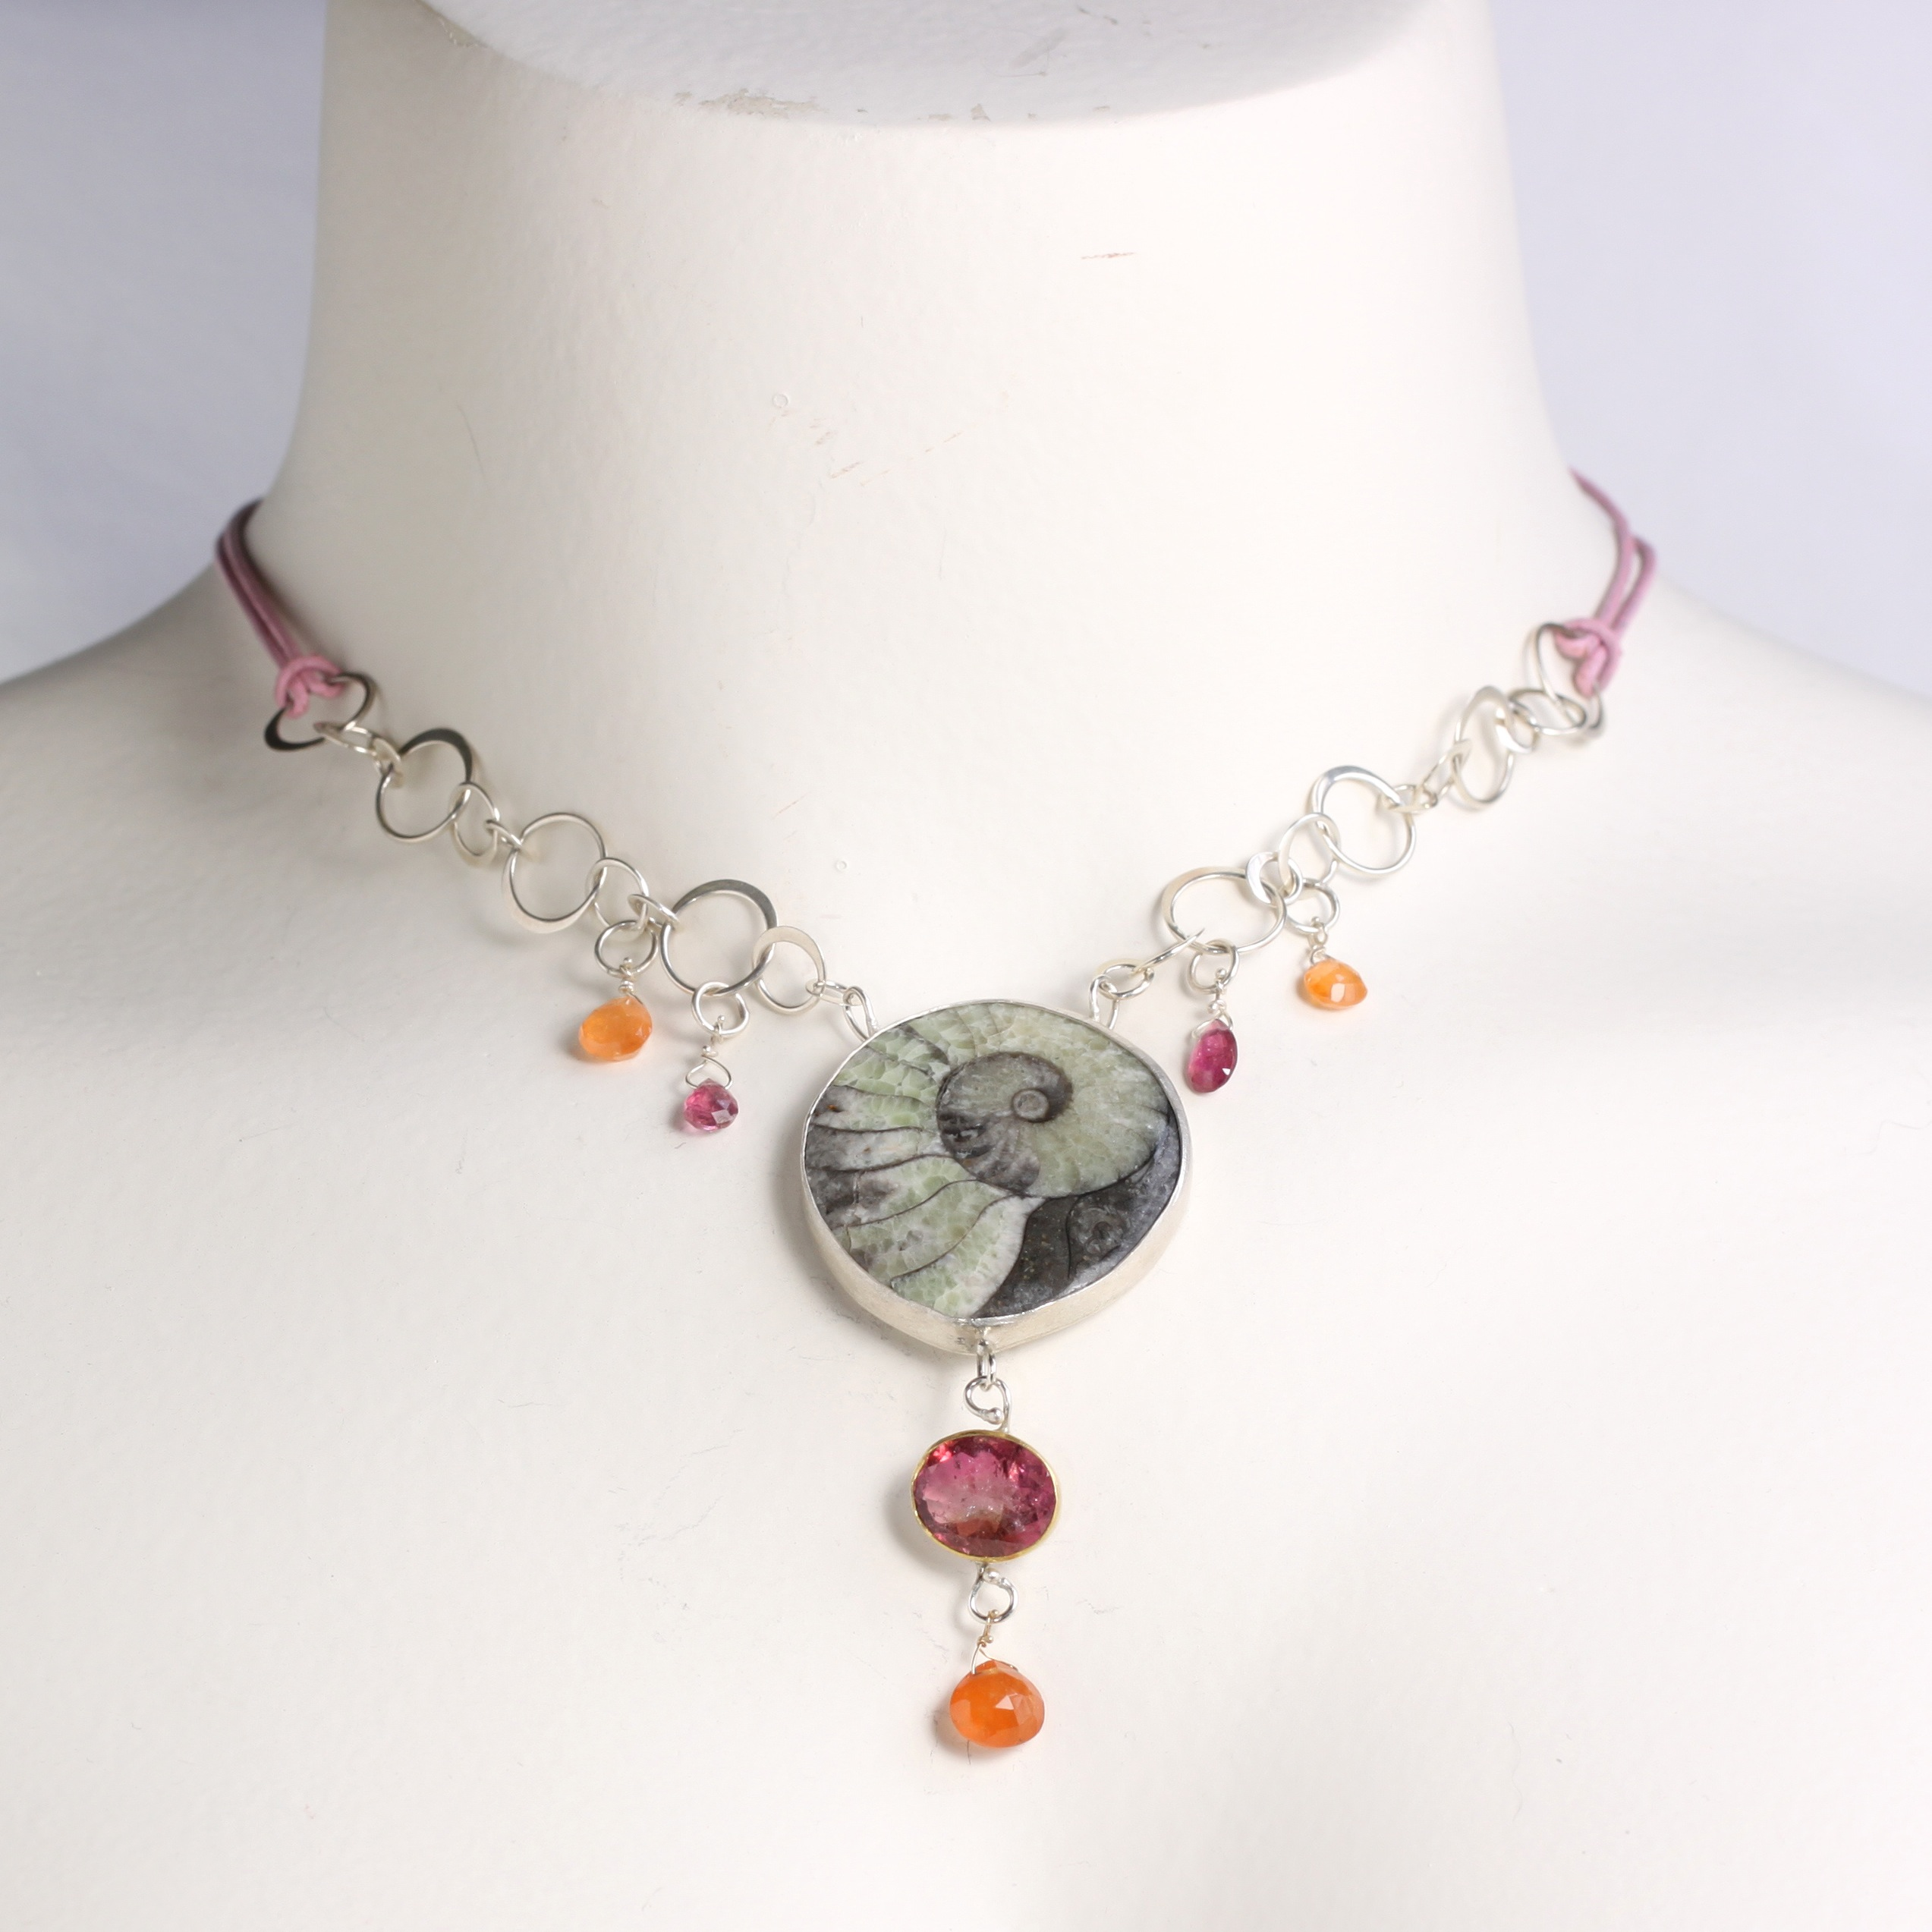 Wanga Necklace: Ammonite Rubelite with Pink Tourmaline & Spessartite (Orange Garnet) Briolettes